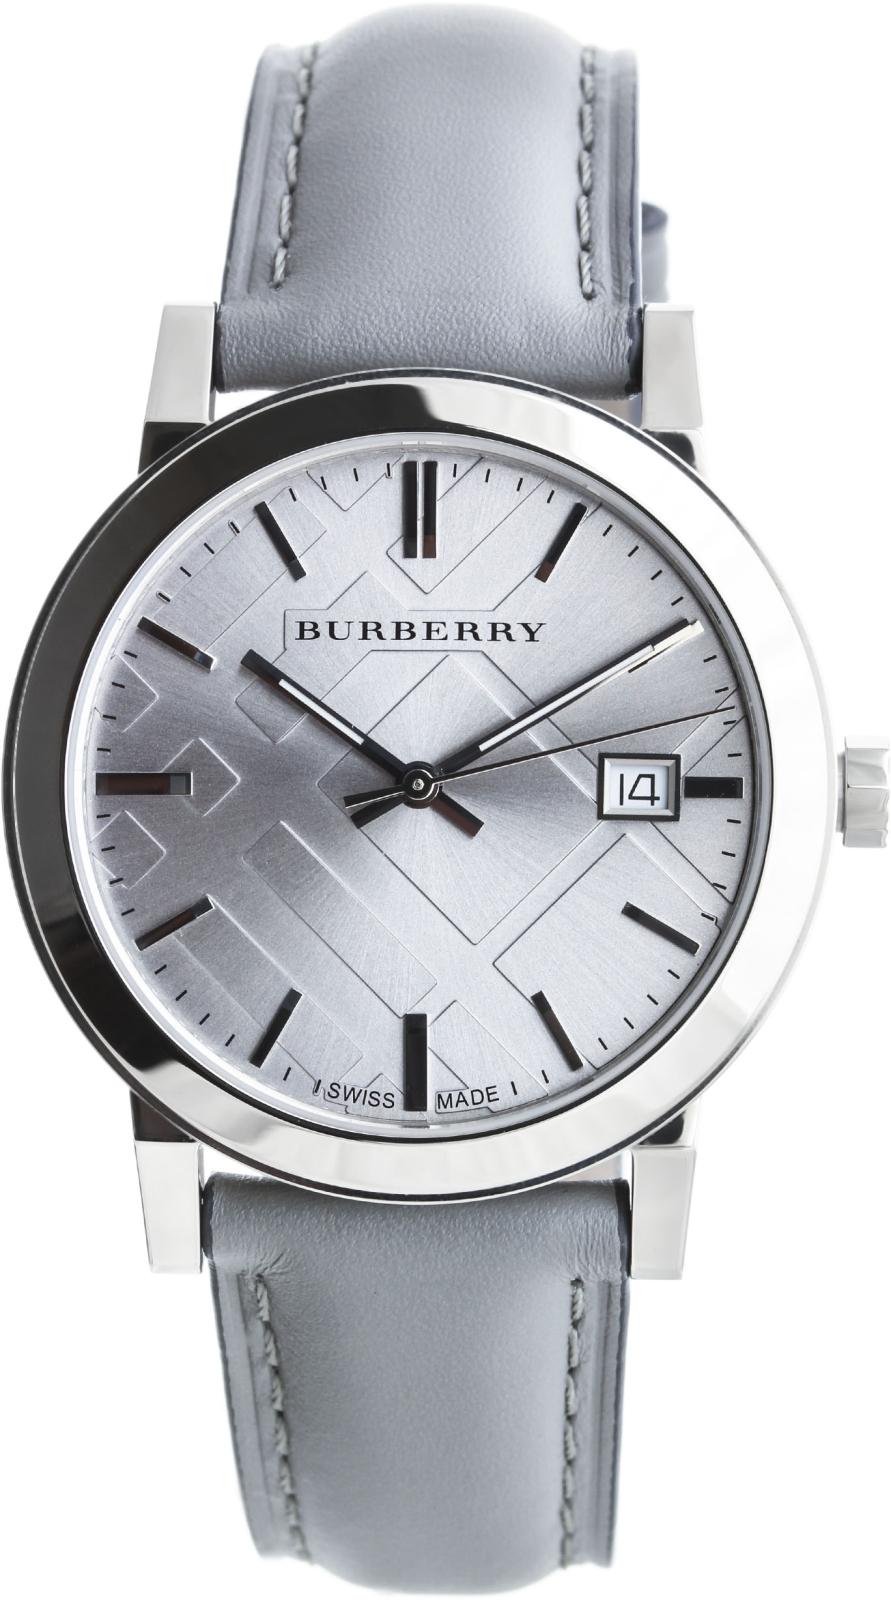 Burberry The City BU9036Наручные часы<br>Швейцарские часы Burberry The City BU9036<br><br>Пол: None<br>Страна-производитель: Швейцария<br>Механизм: Кварцевый<br>Материал корпуса: Сталь<br>Материал ремня/браслета: Кожа<br>Водозащита, диапазон: None<br>Стекло: Сапфировое<br>Толщина корпуса: 8,5 мм<br>Стиль: None